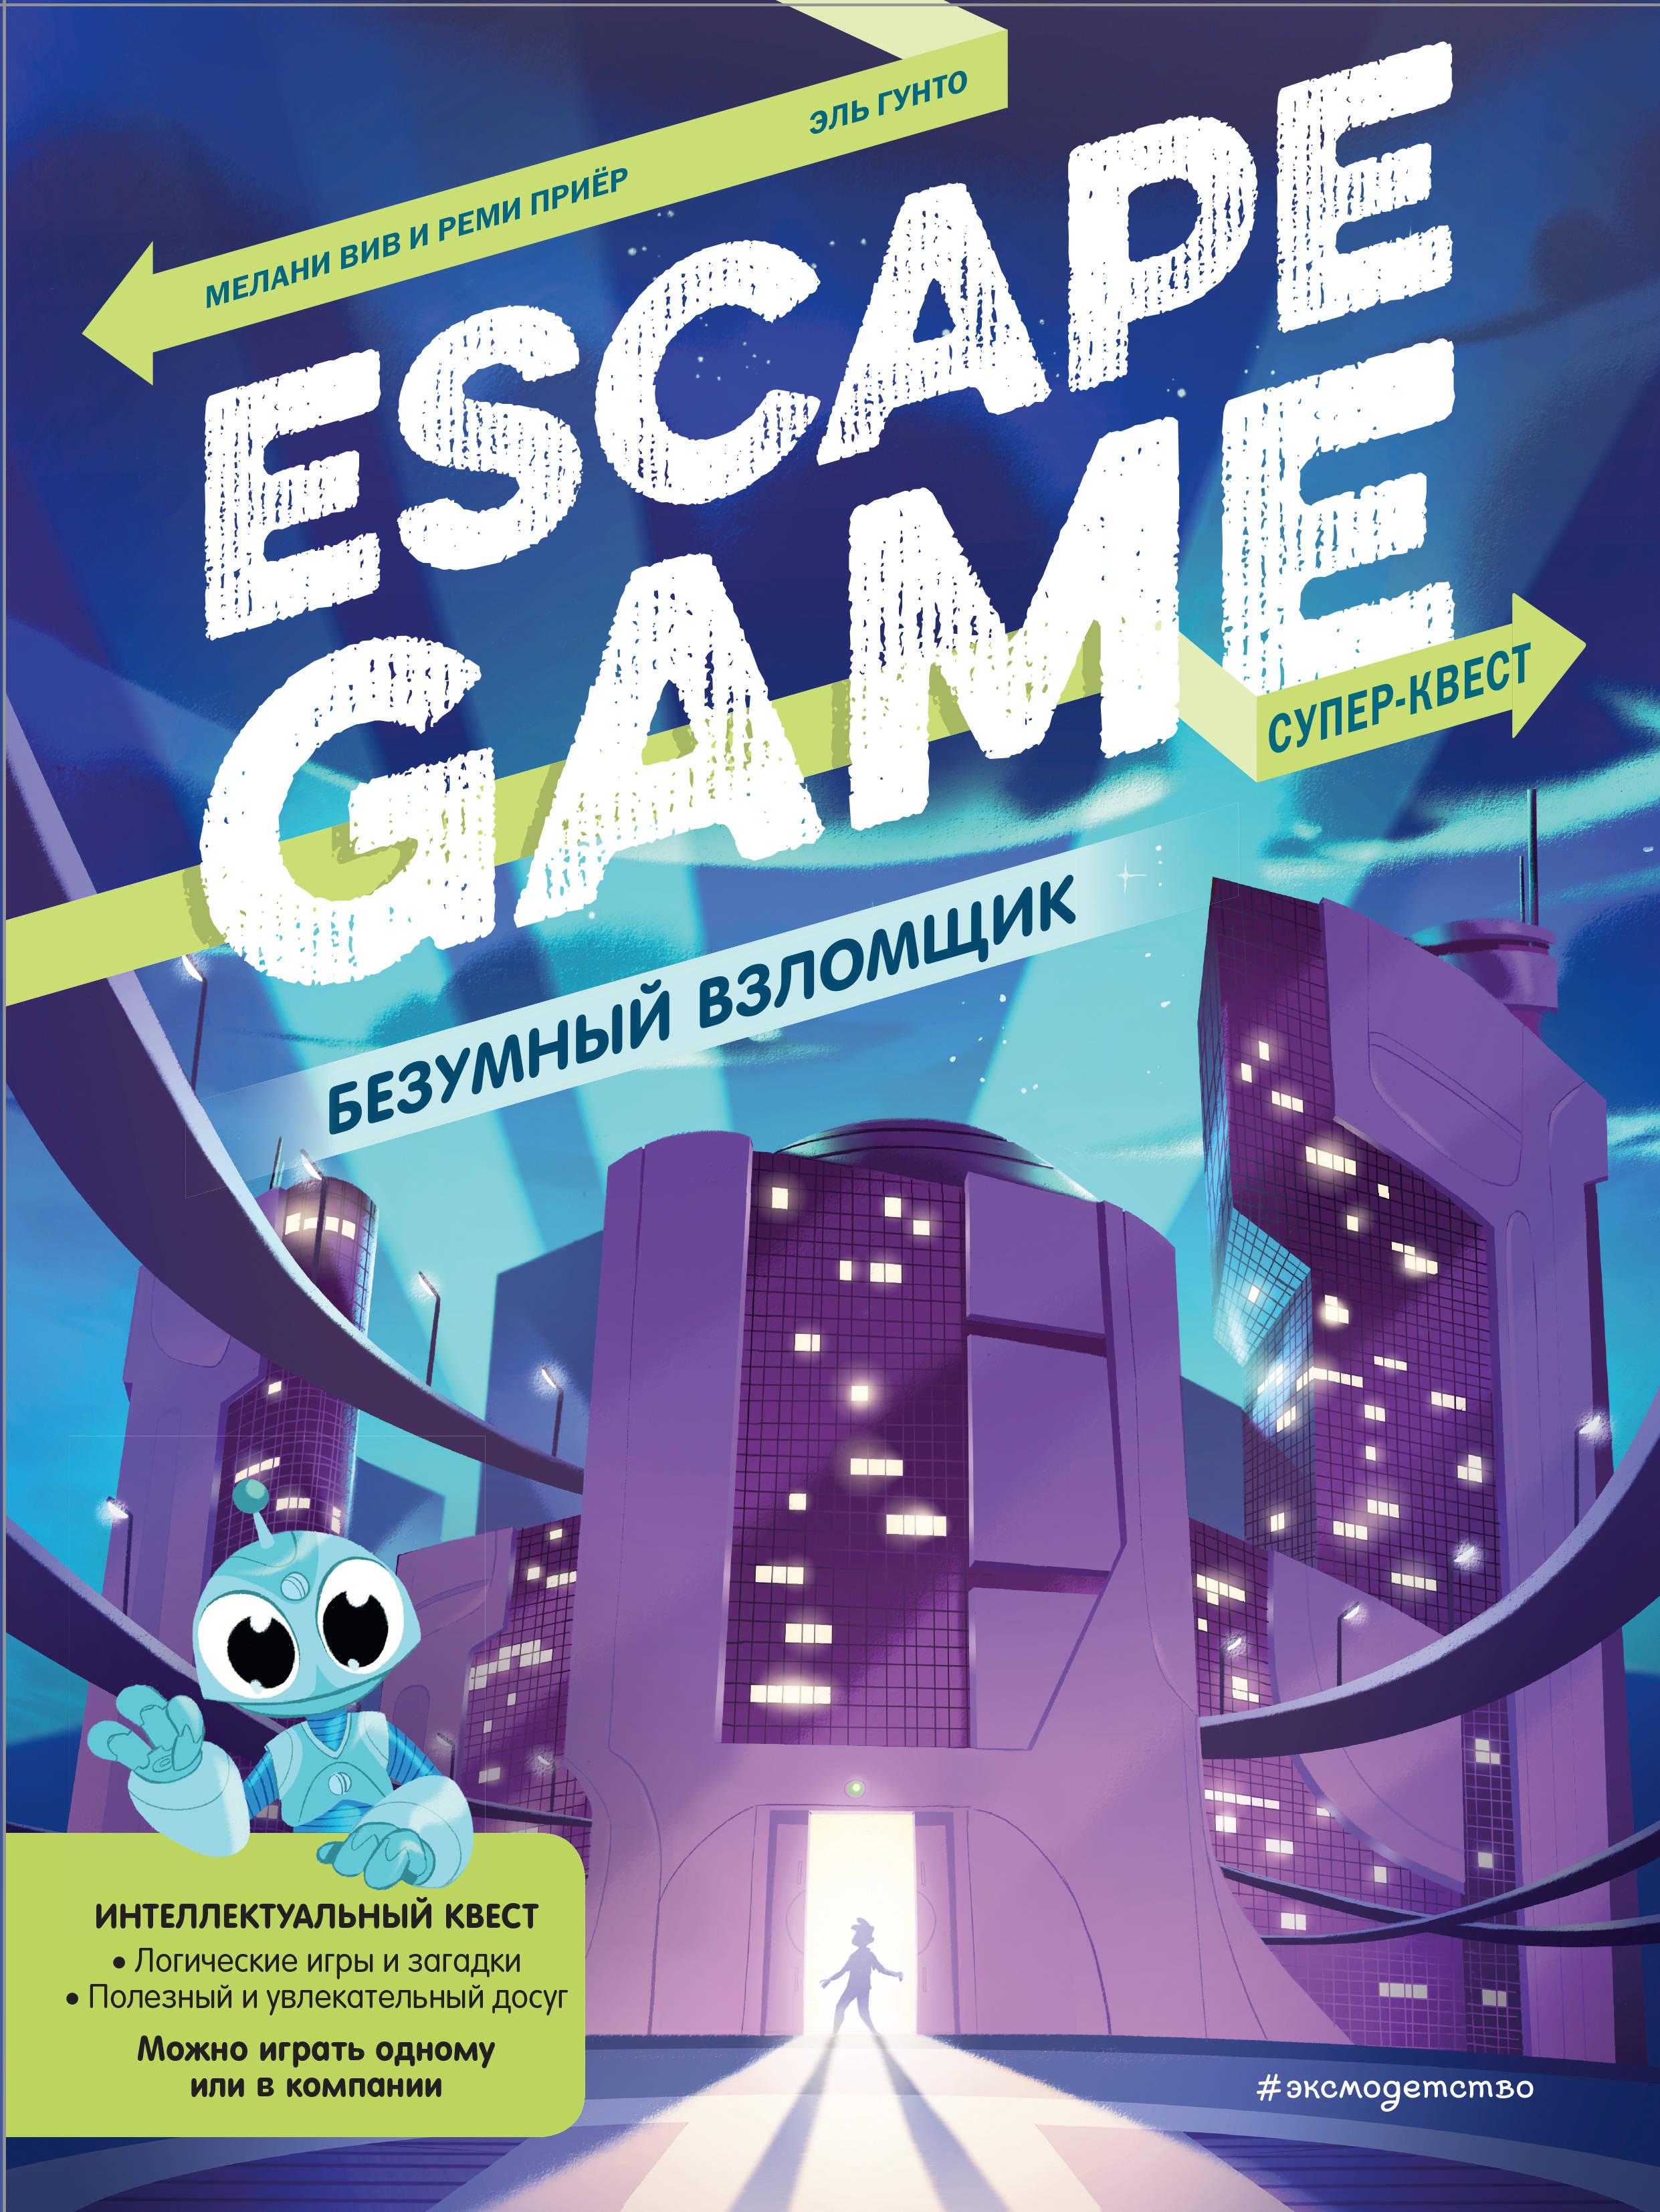 Bezumnyj vzlomschik. Escape Game